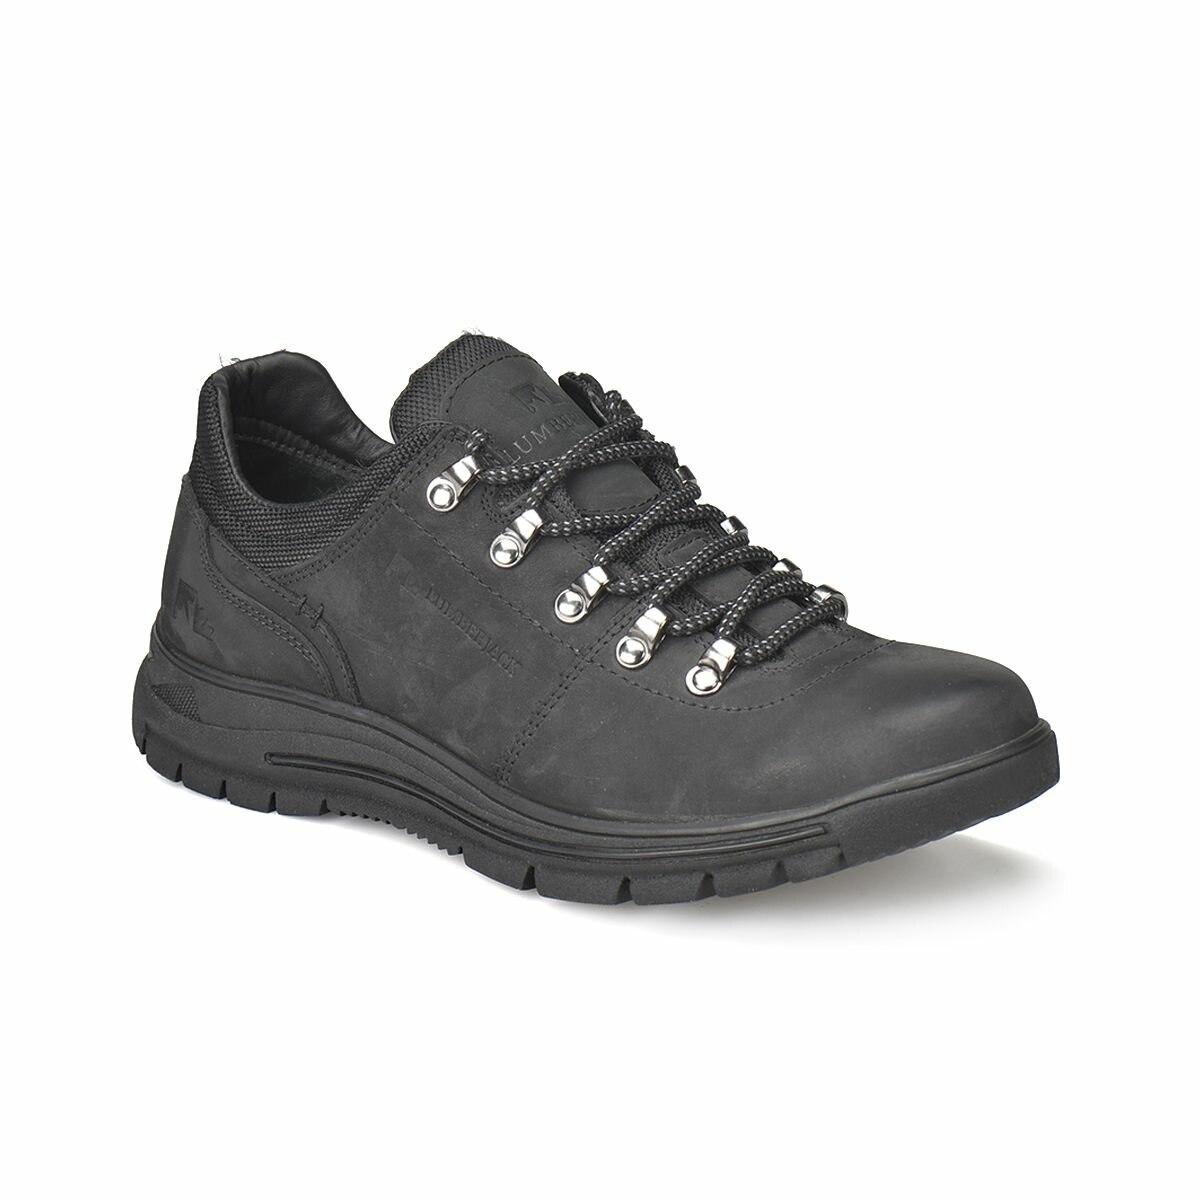 FLO THE LINDUM NUB Black Male Outdoor Shoes LUMBERJACK